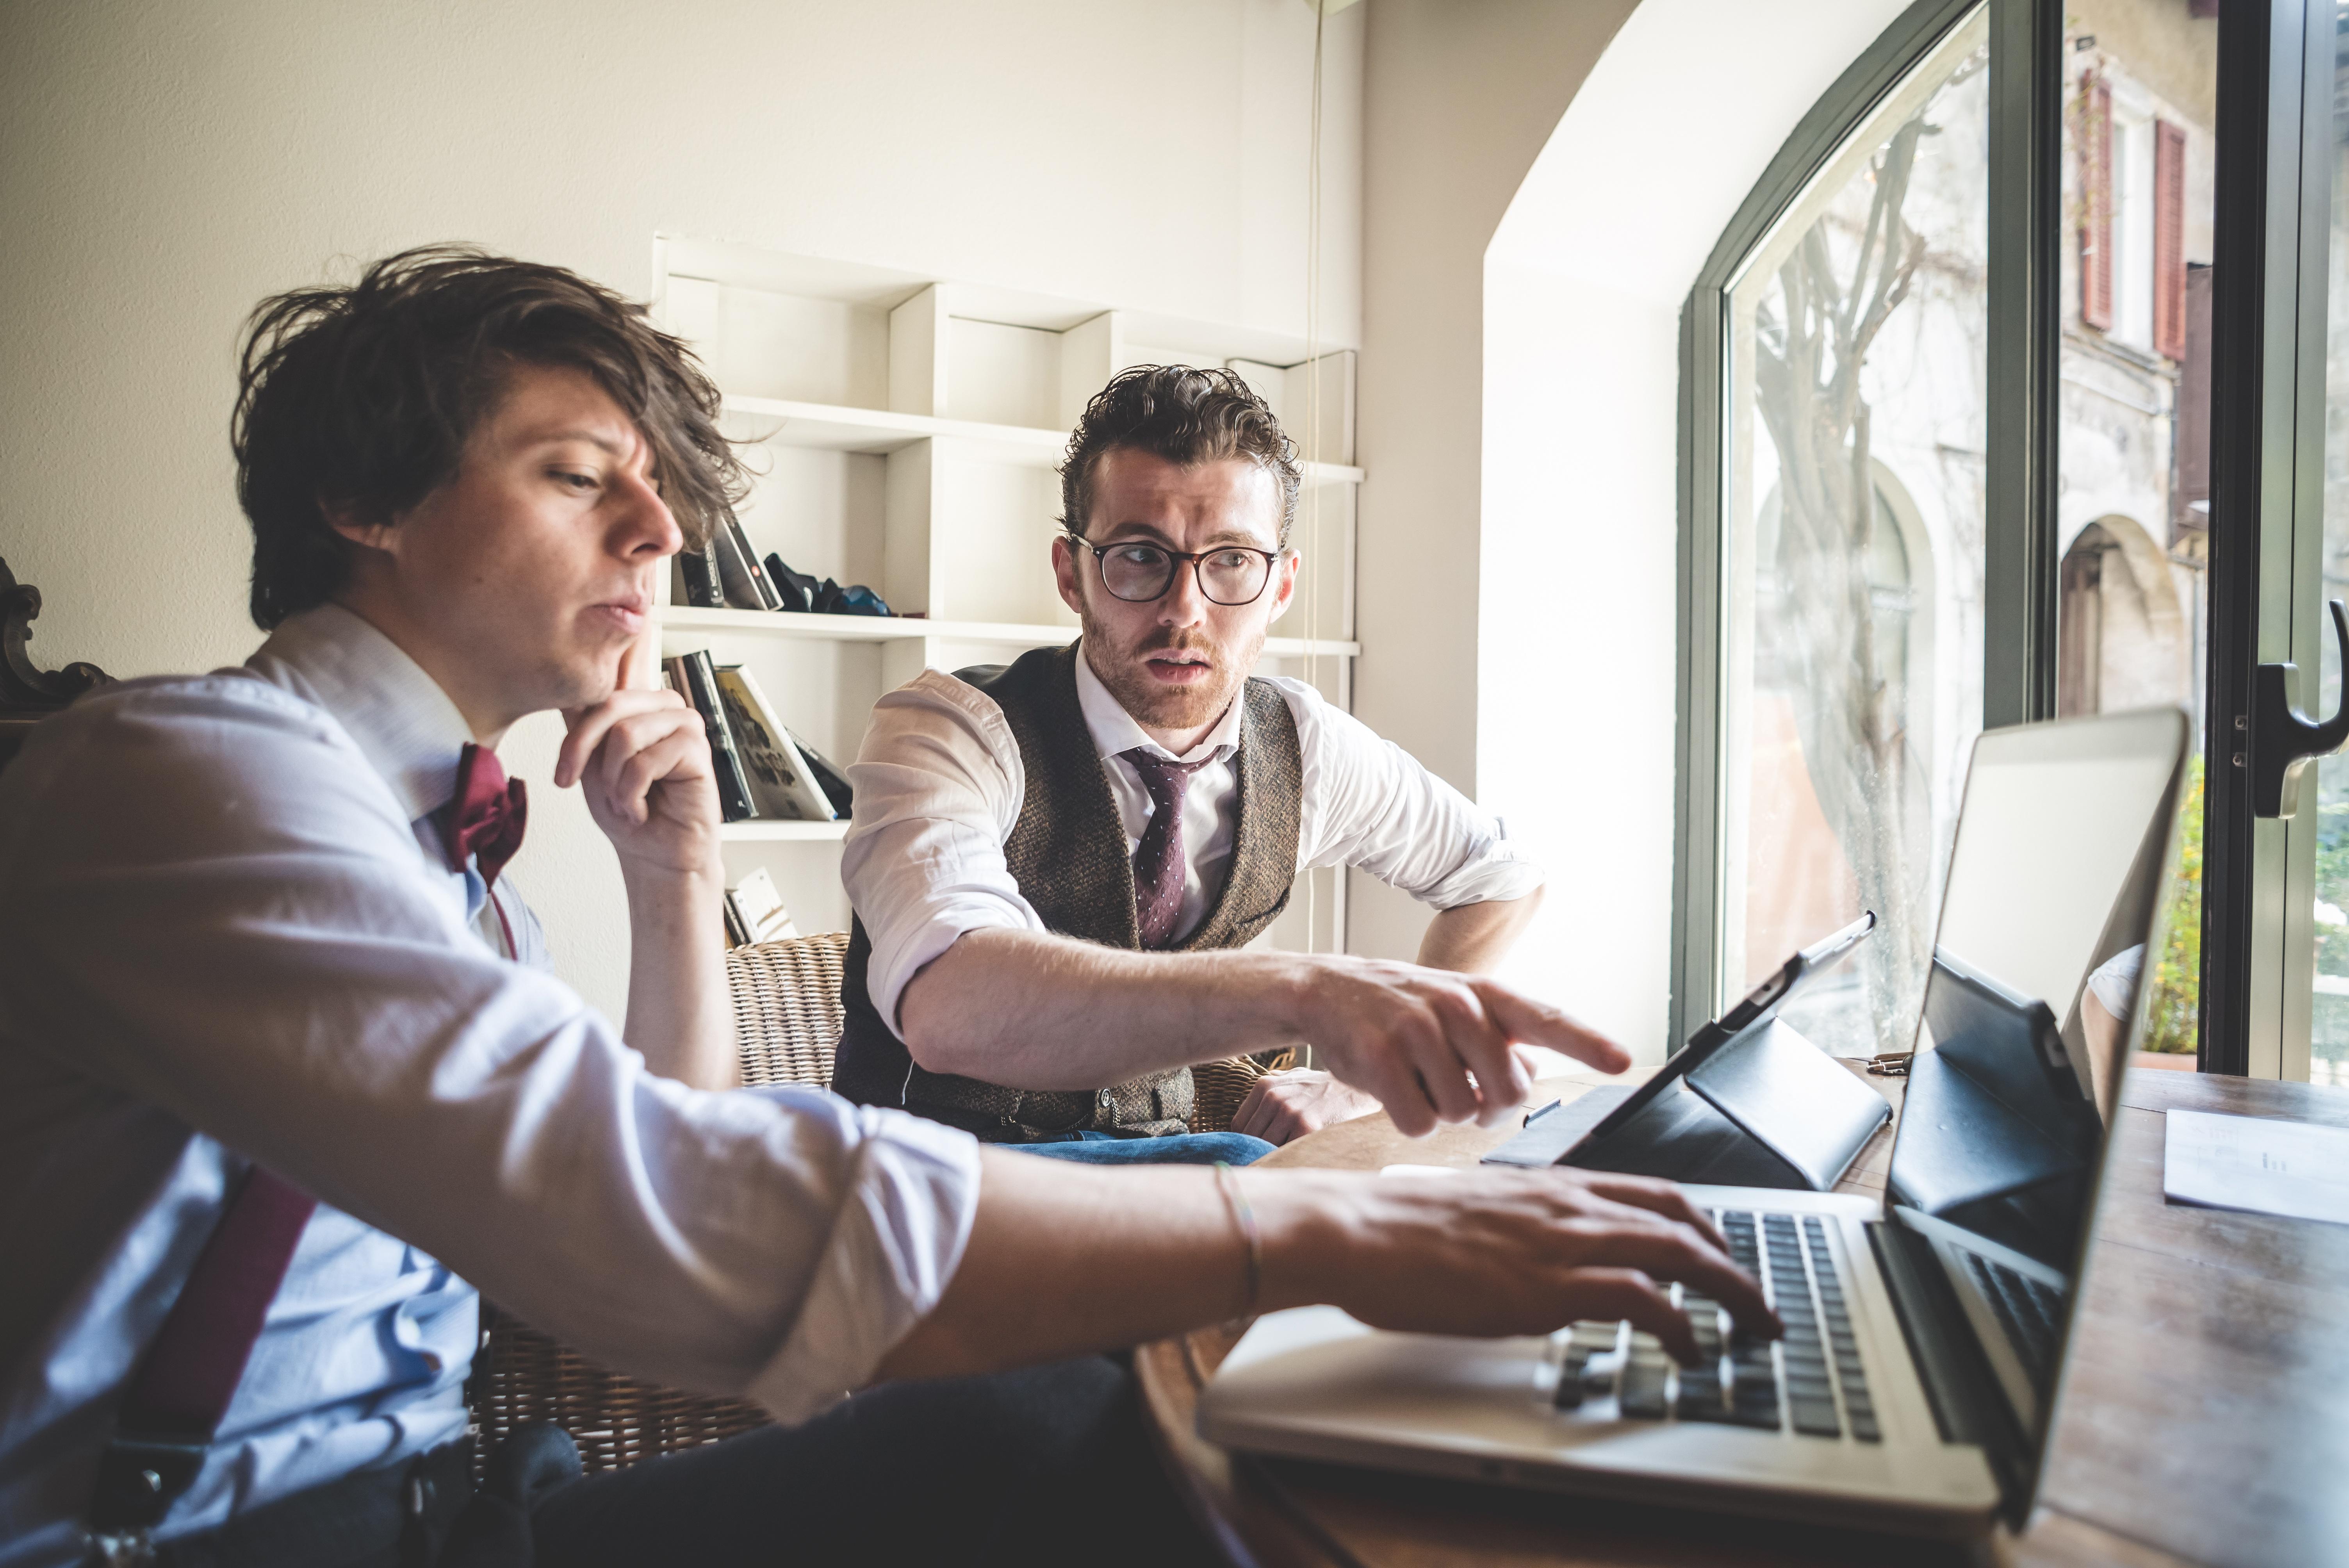 Impulsa tu carrera profesional y estudia una licenciatura ejecutiva - Featured Image